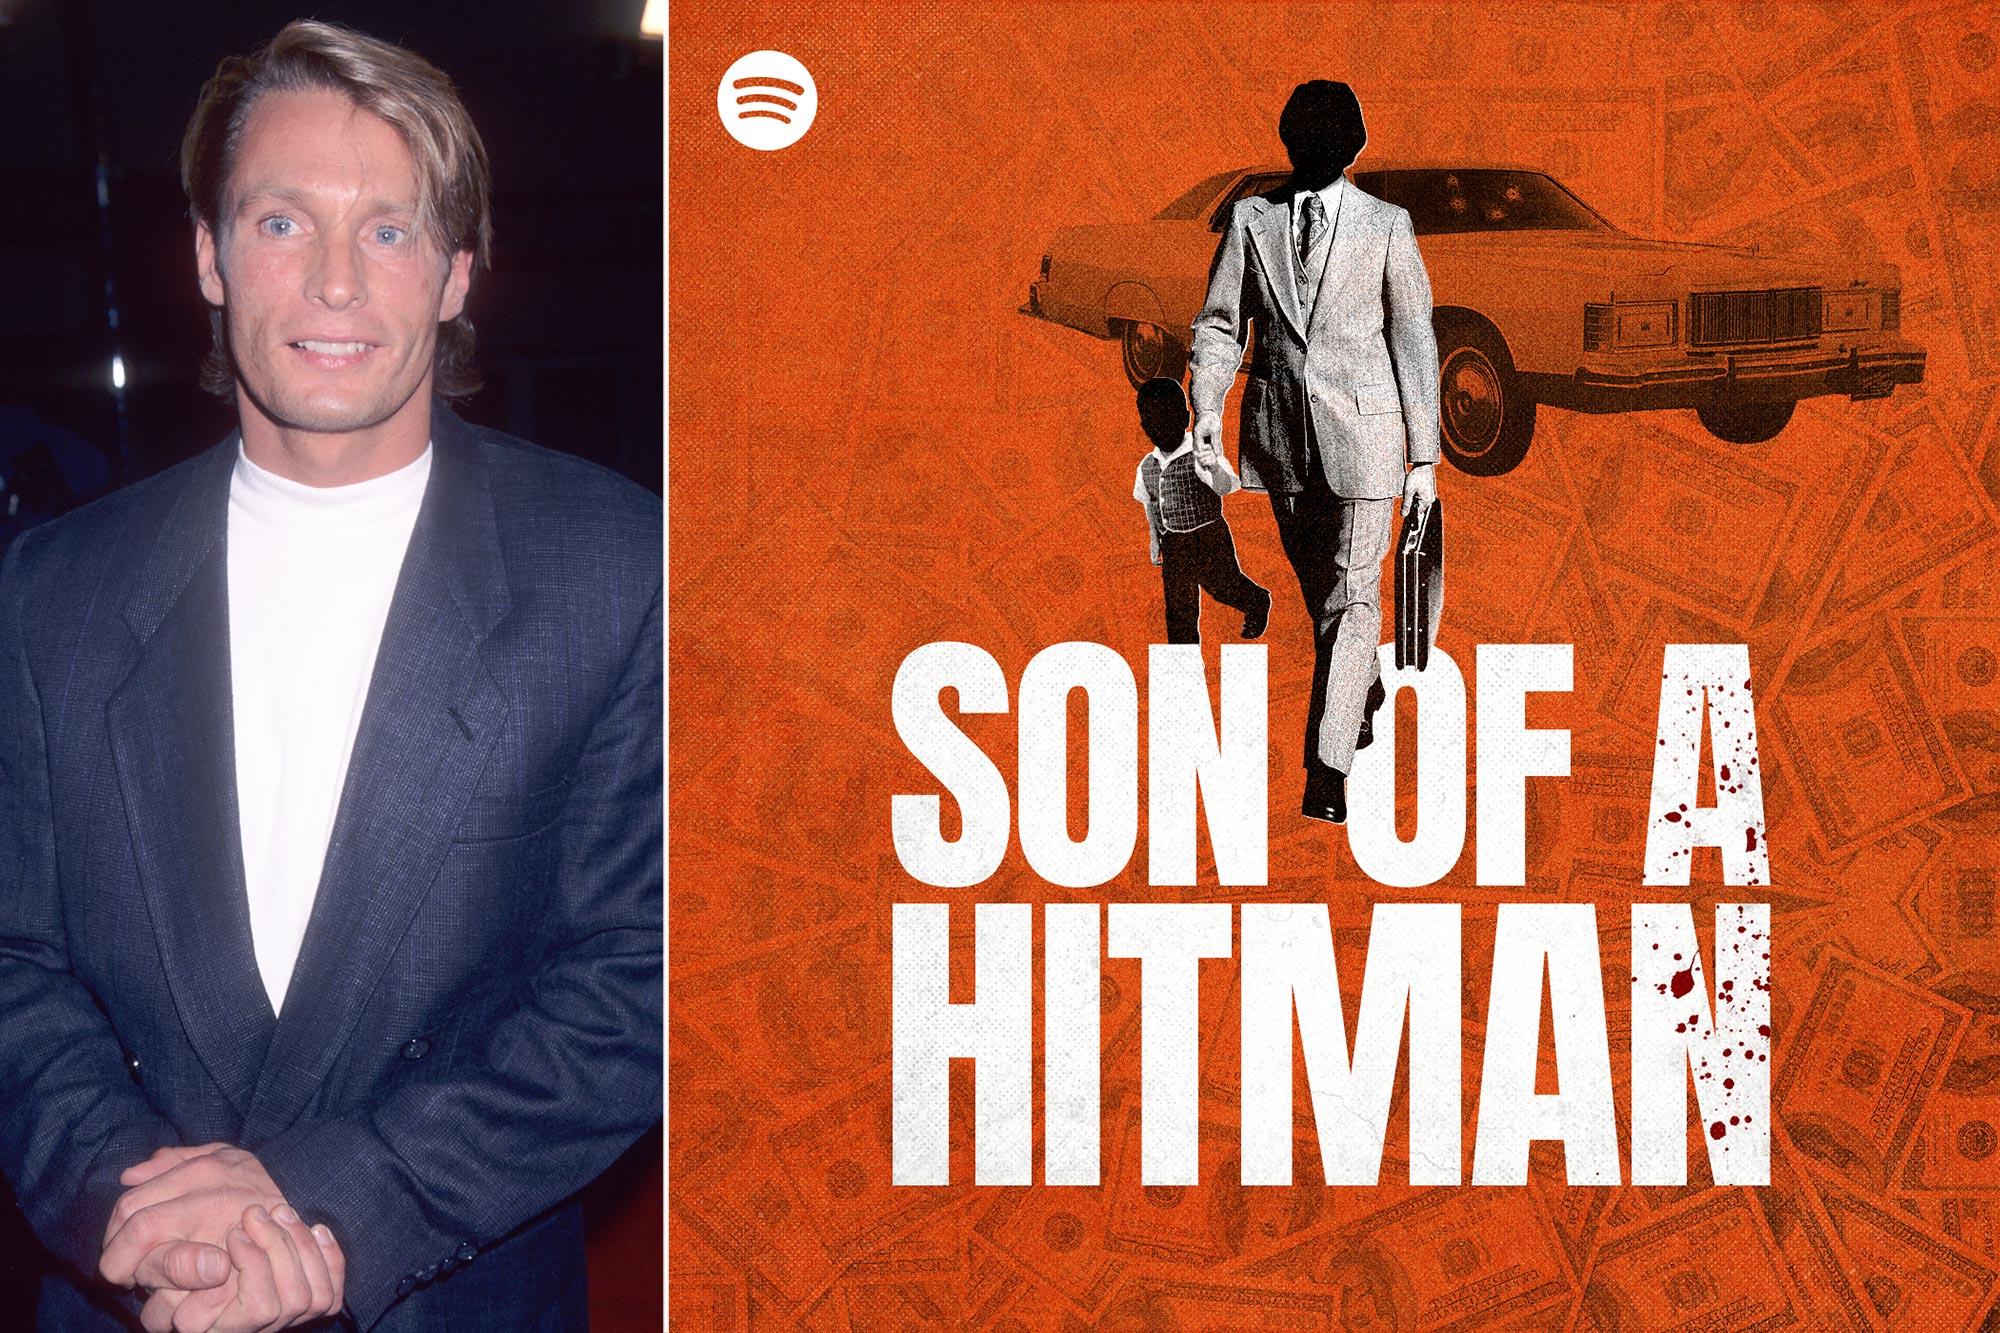 Brett Harrelson, Son of a Hitman